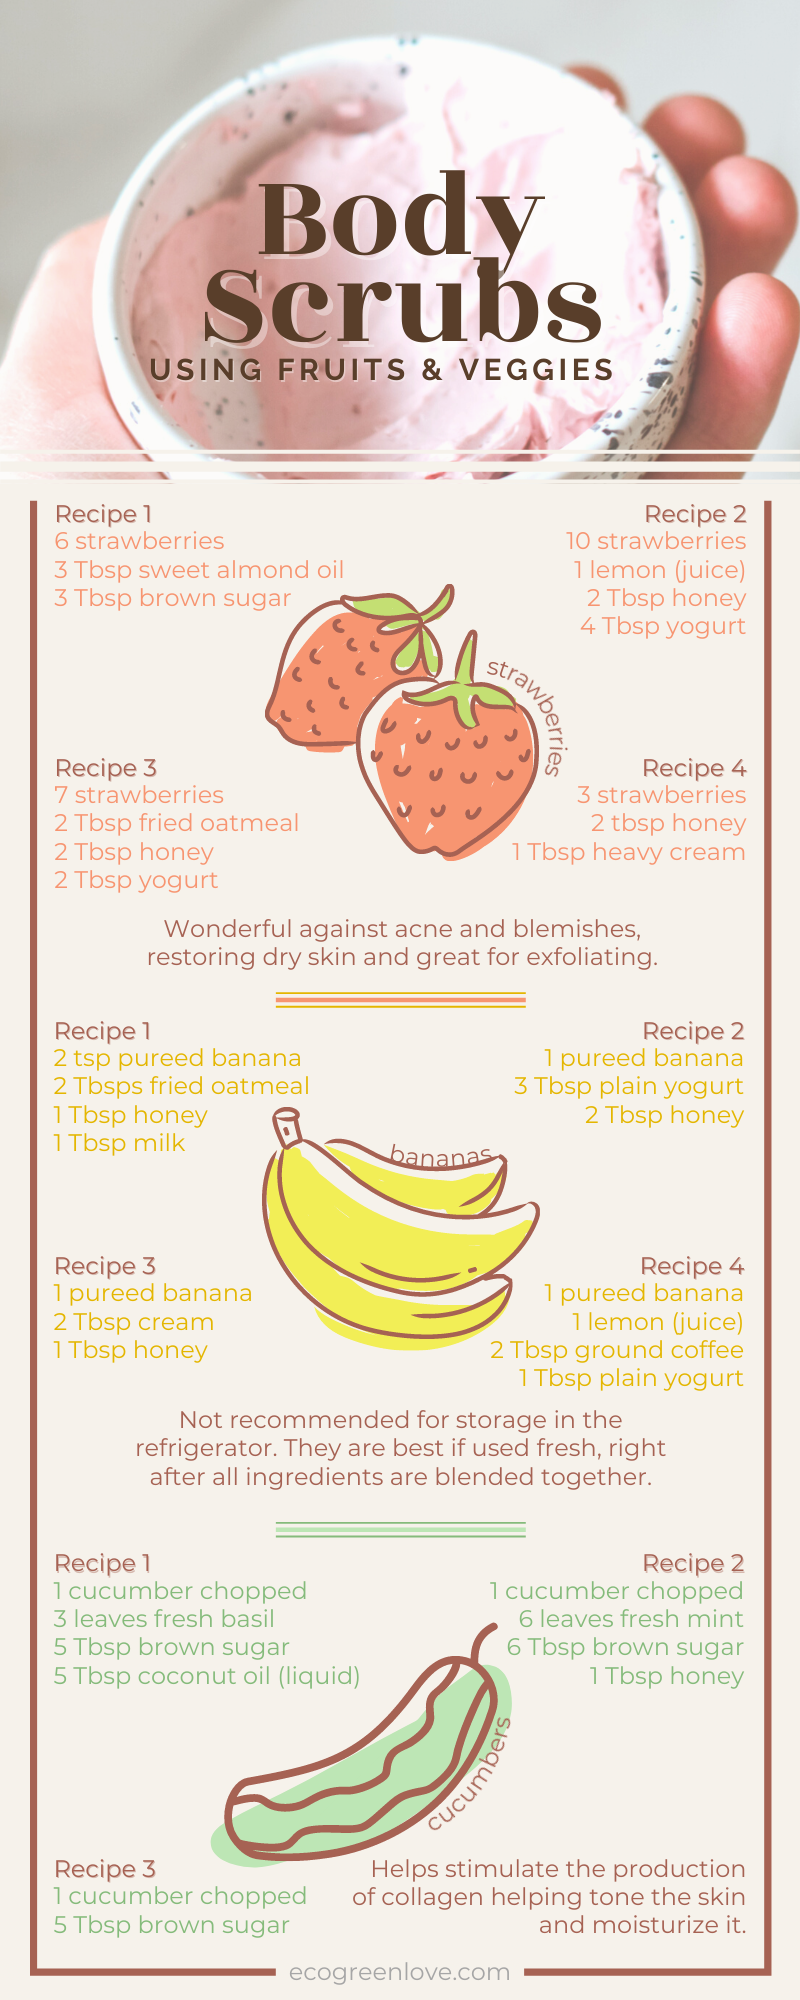 DIY Body Scrubs using Fruits & Veggies [Recipes] | ecogreenlove